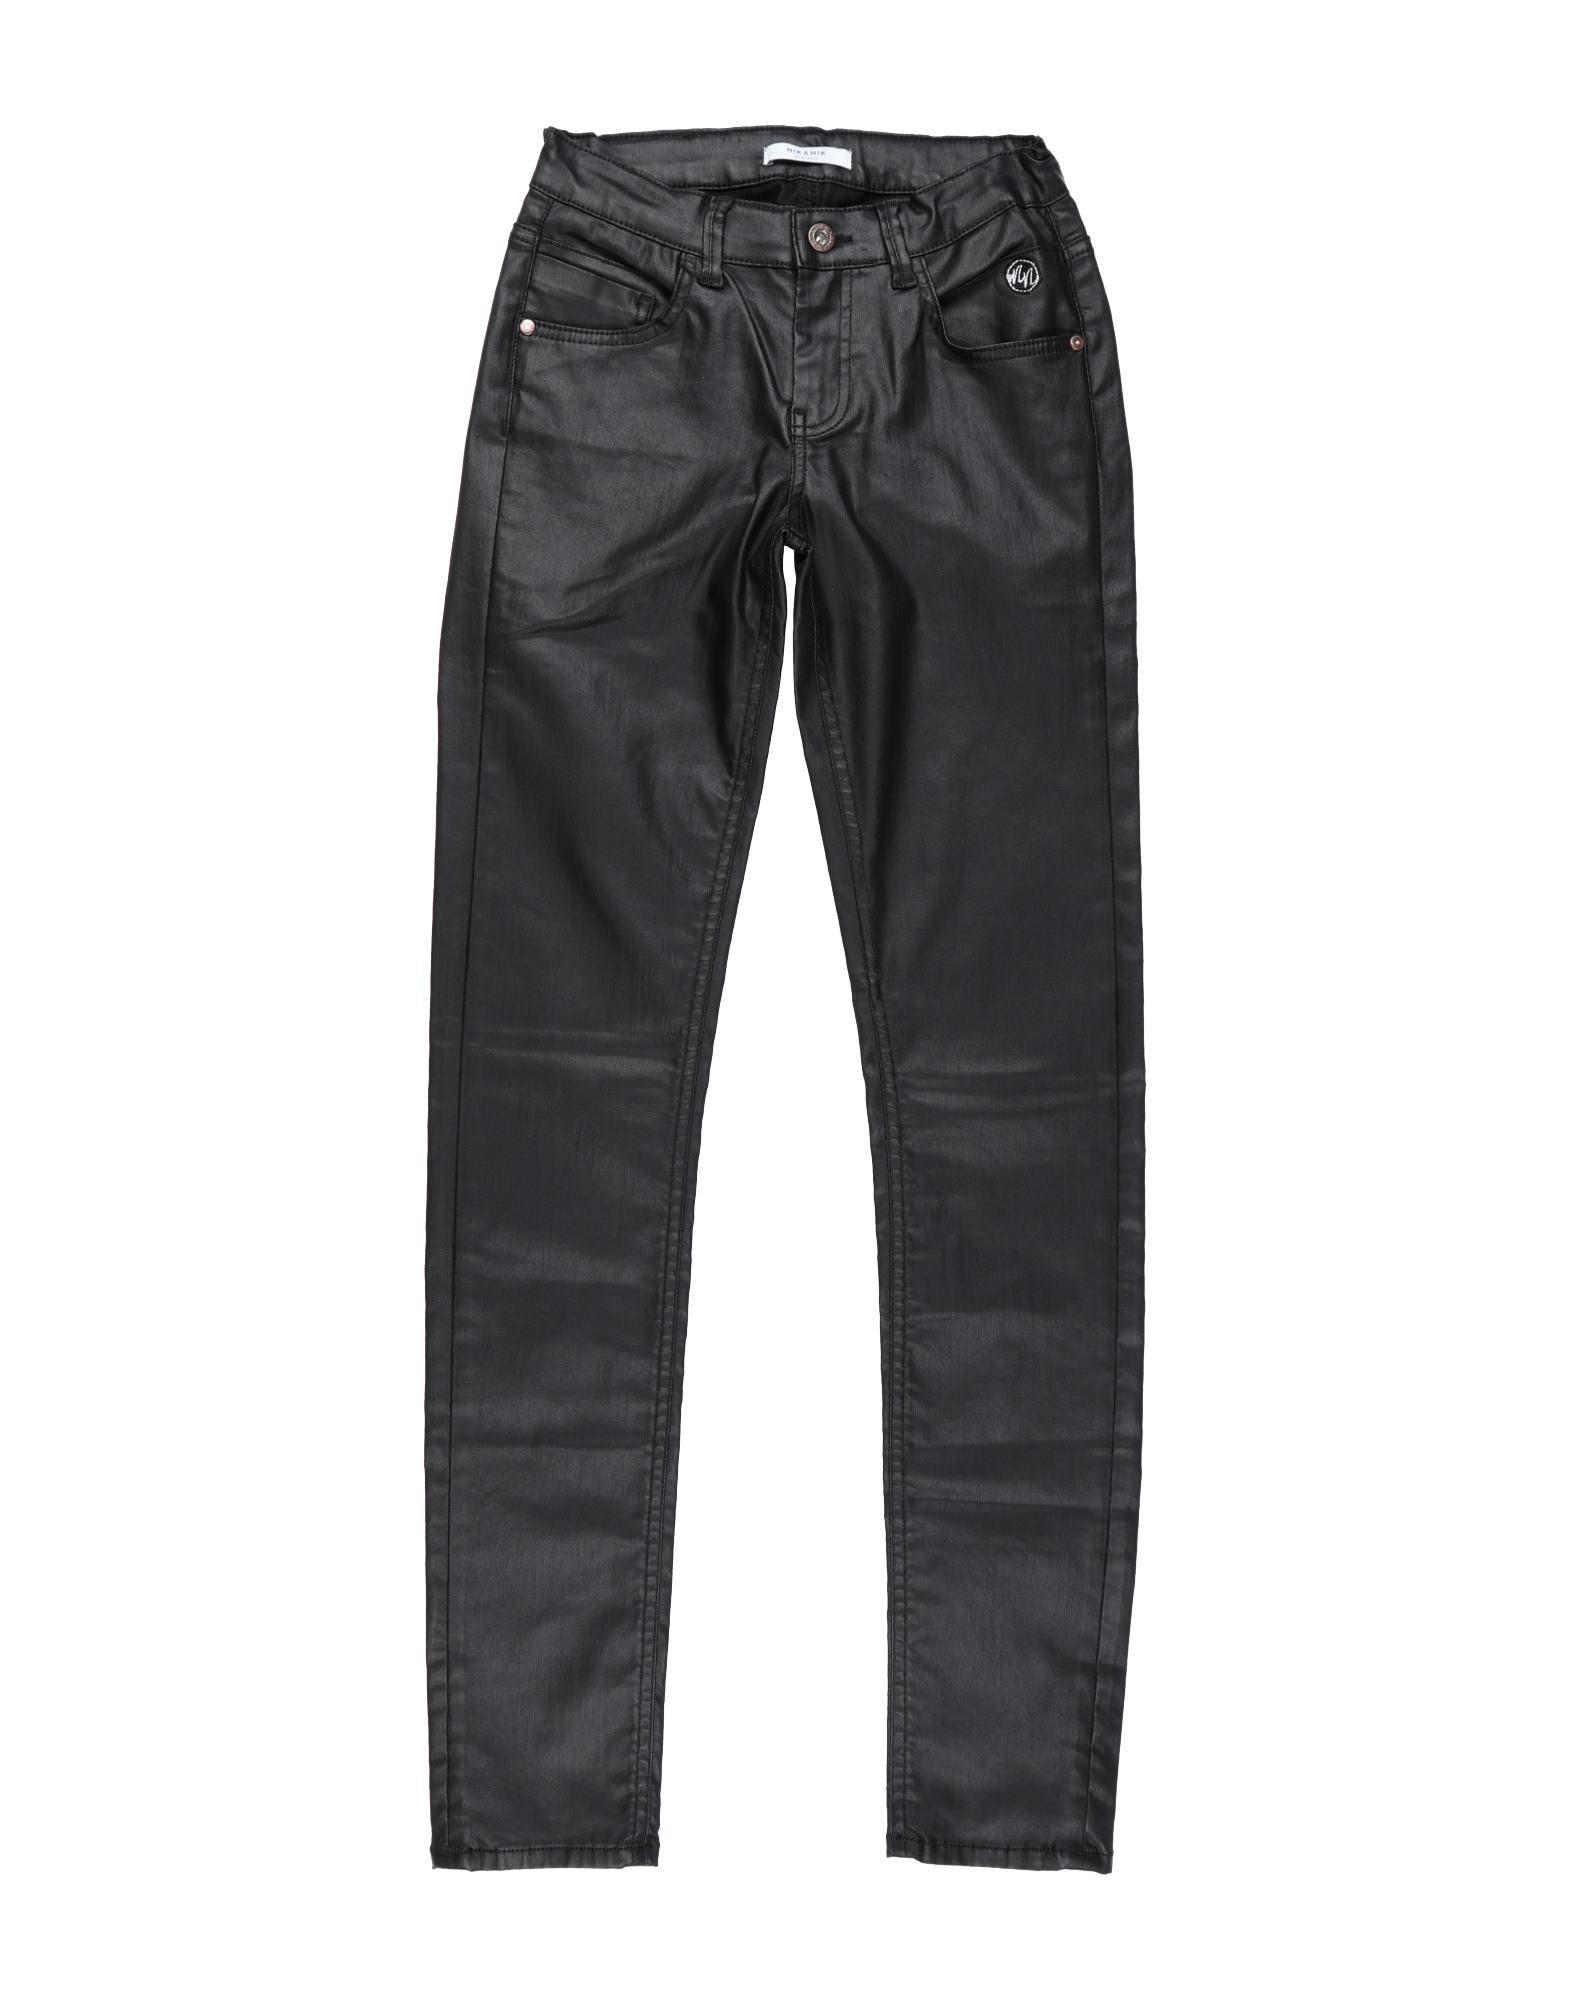 Nik & Nik Kids' Casual Pants In Black